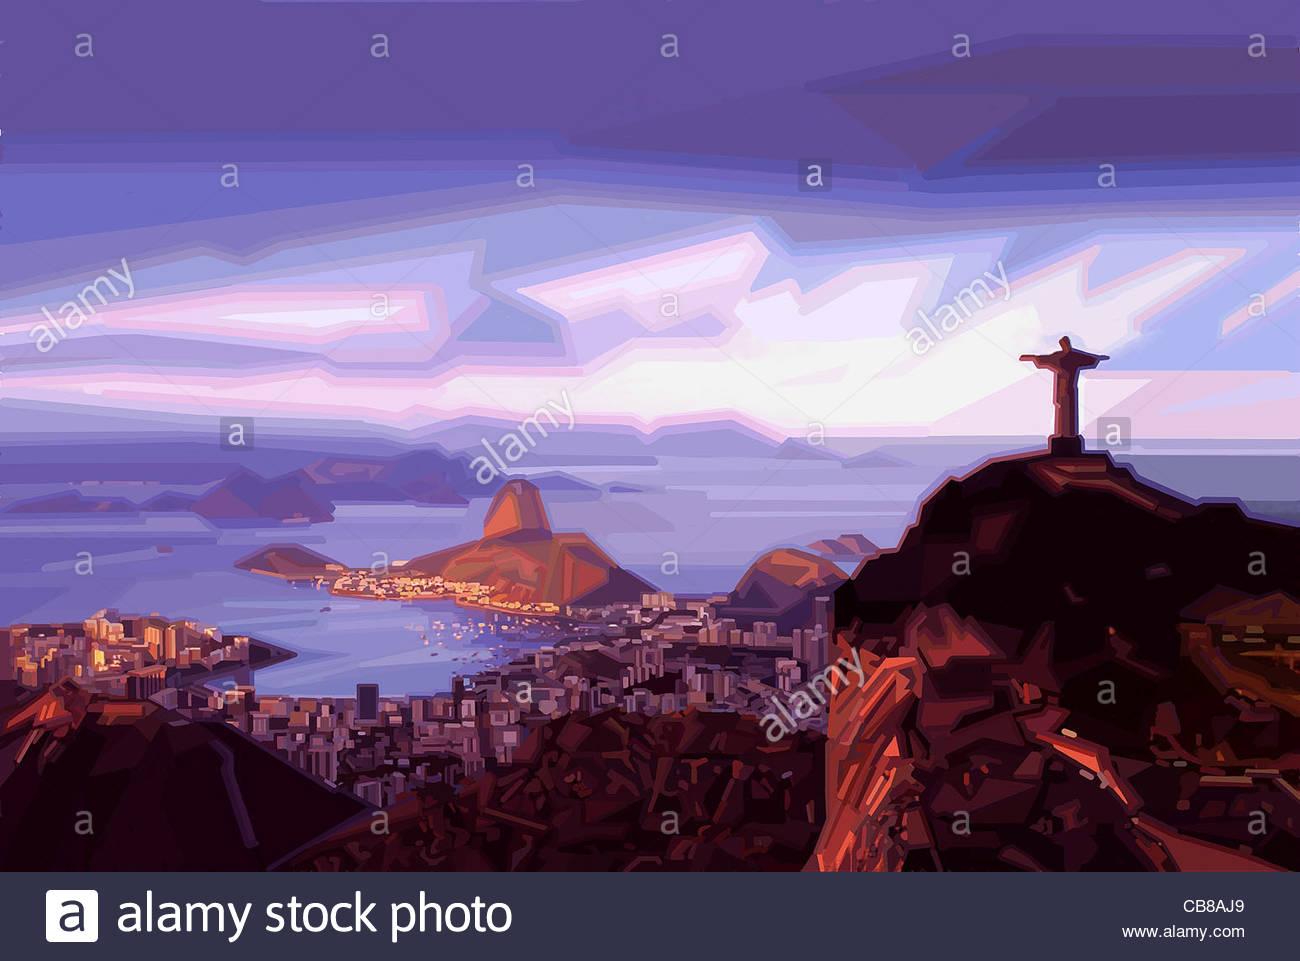 Series City Rio de Janeiro Carnival City urban urbanity Cities city city In Stock Foto